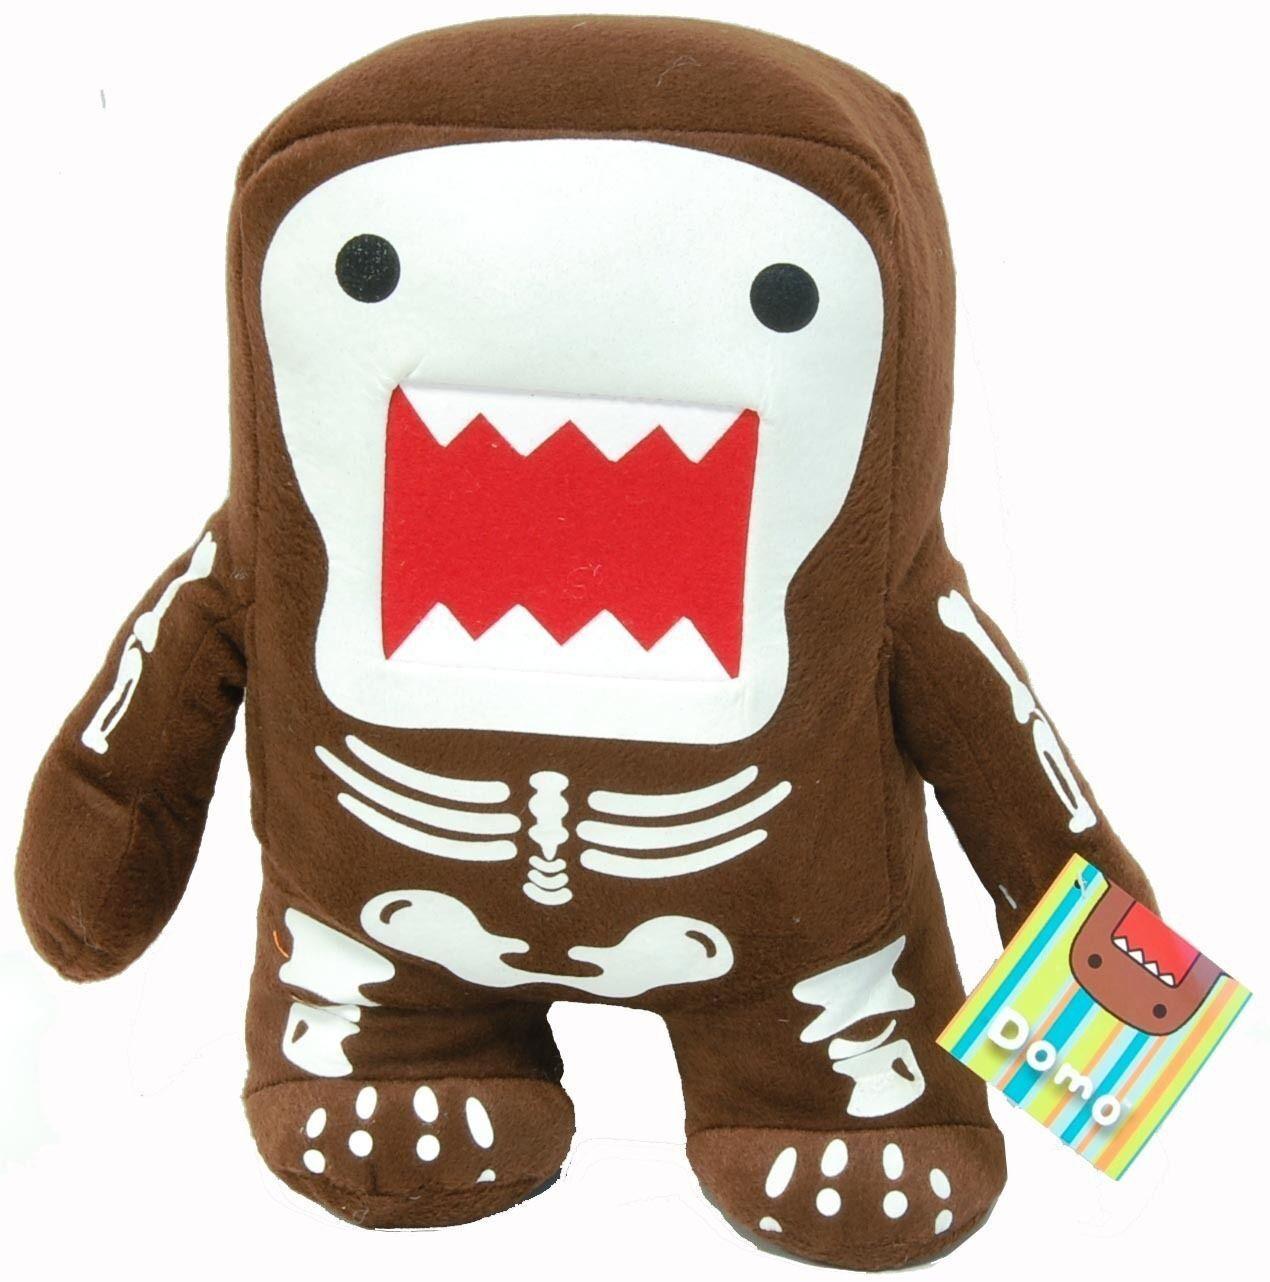 Domo Kun 18  X-Large Skeleton Plush Spielzeug-18  braun Standing Domo Kun Plush-New